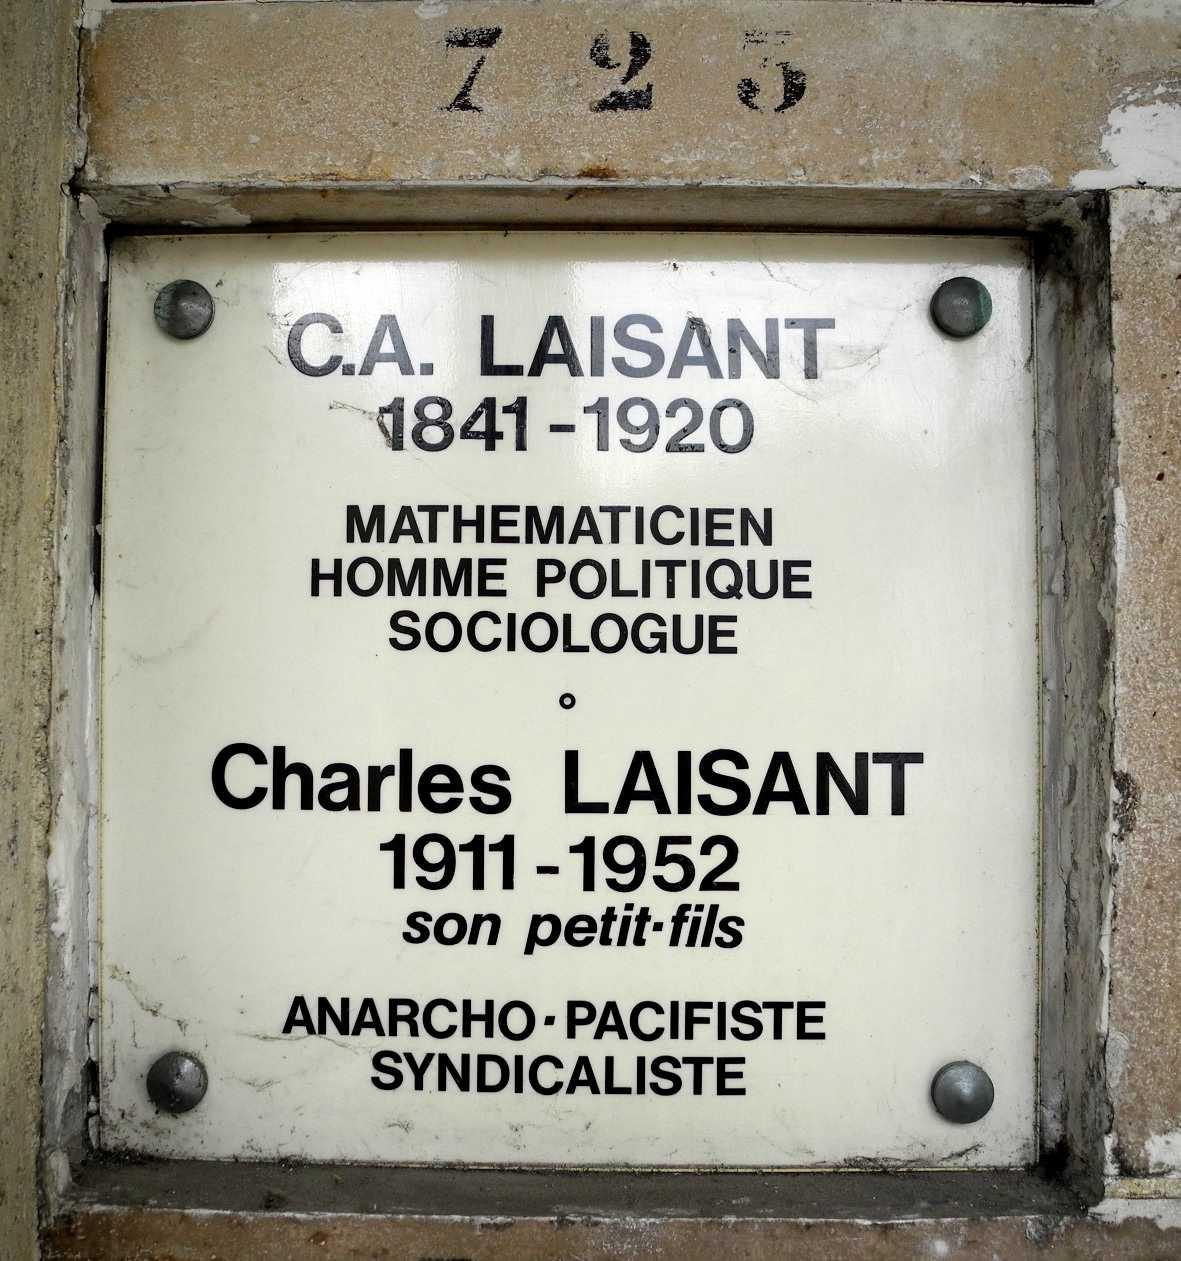 Tomba de Charles Laisant al columbari del cementiri parisenc de Père Lachaise